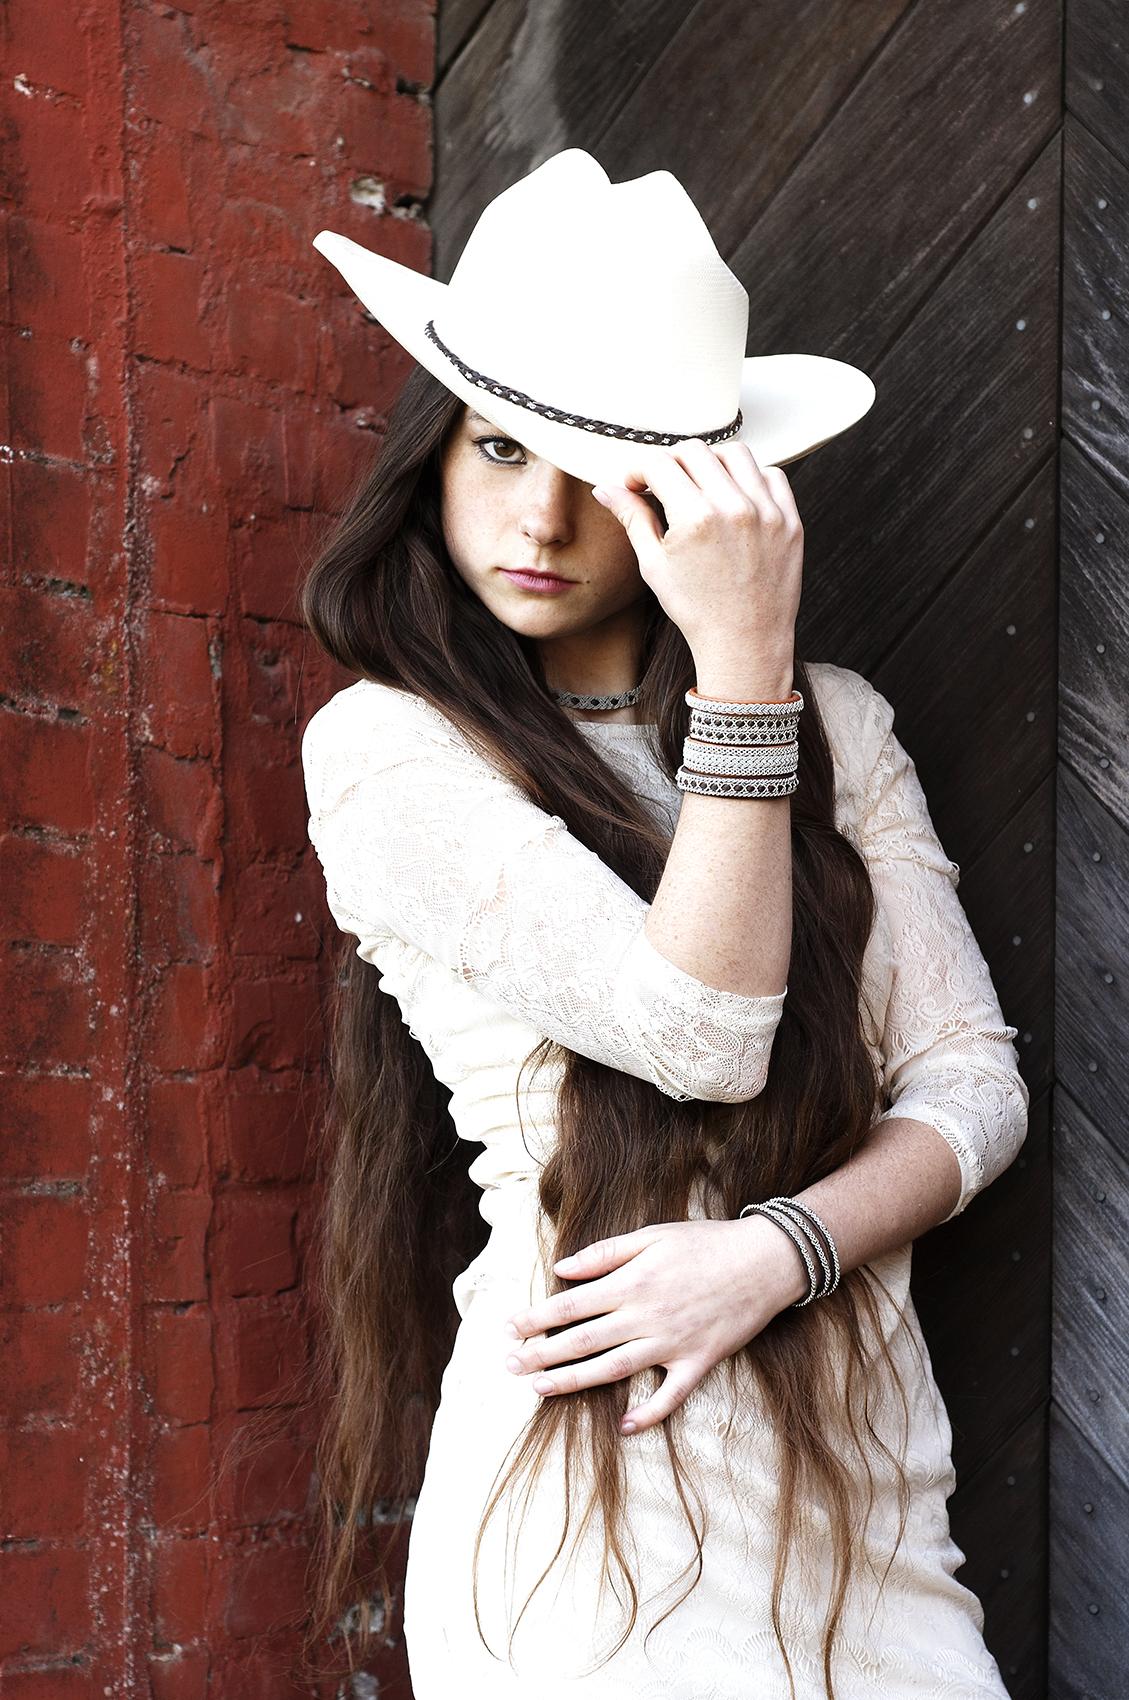 Ayla cowboy hat copy.jpg